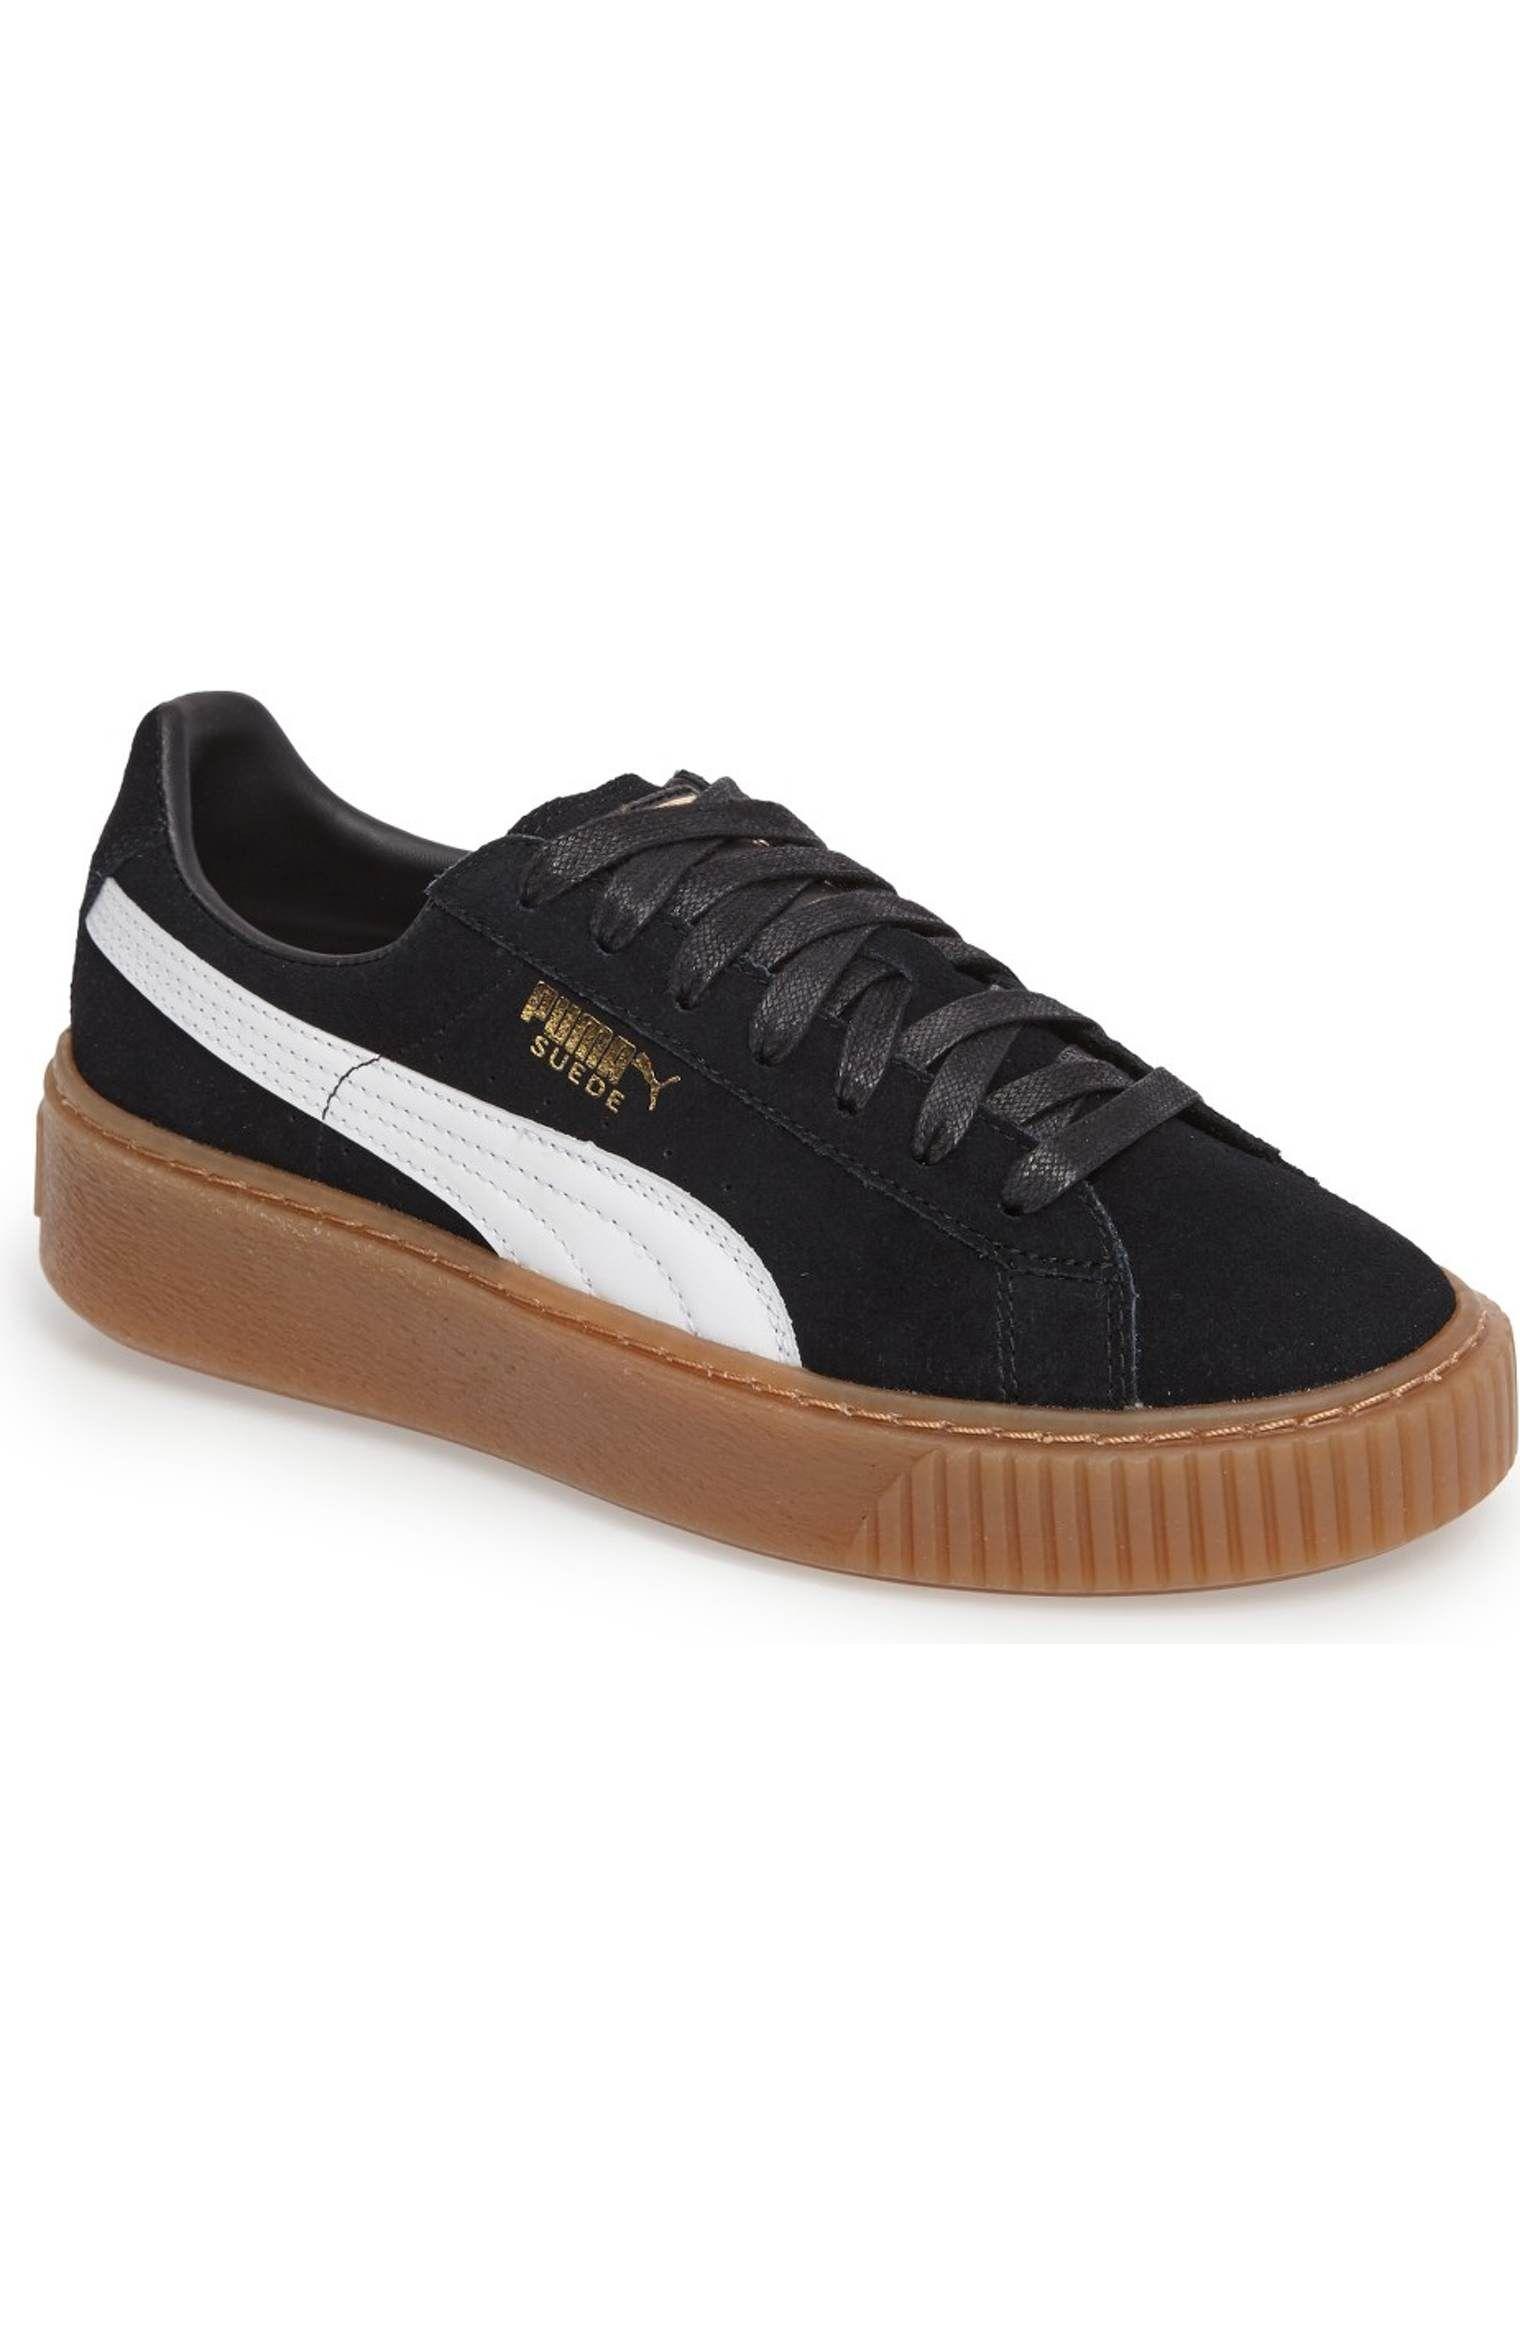 2aeaf0084d9 Main Image - PUMA Suede Platform Core Sneaker (Women)